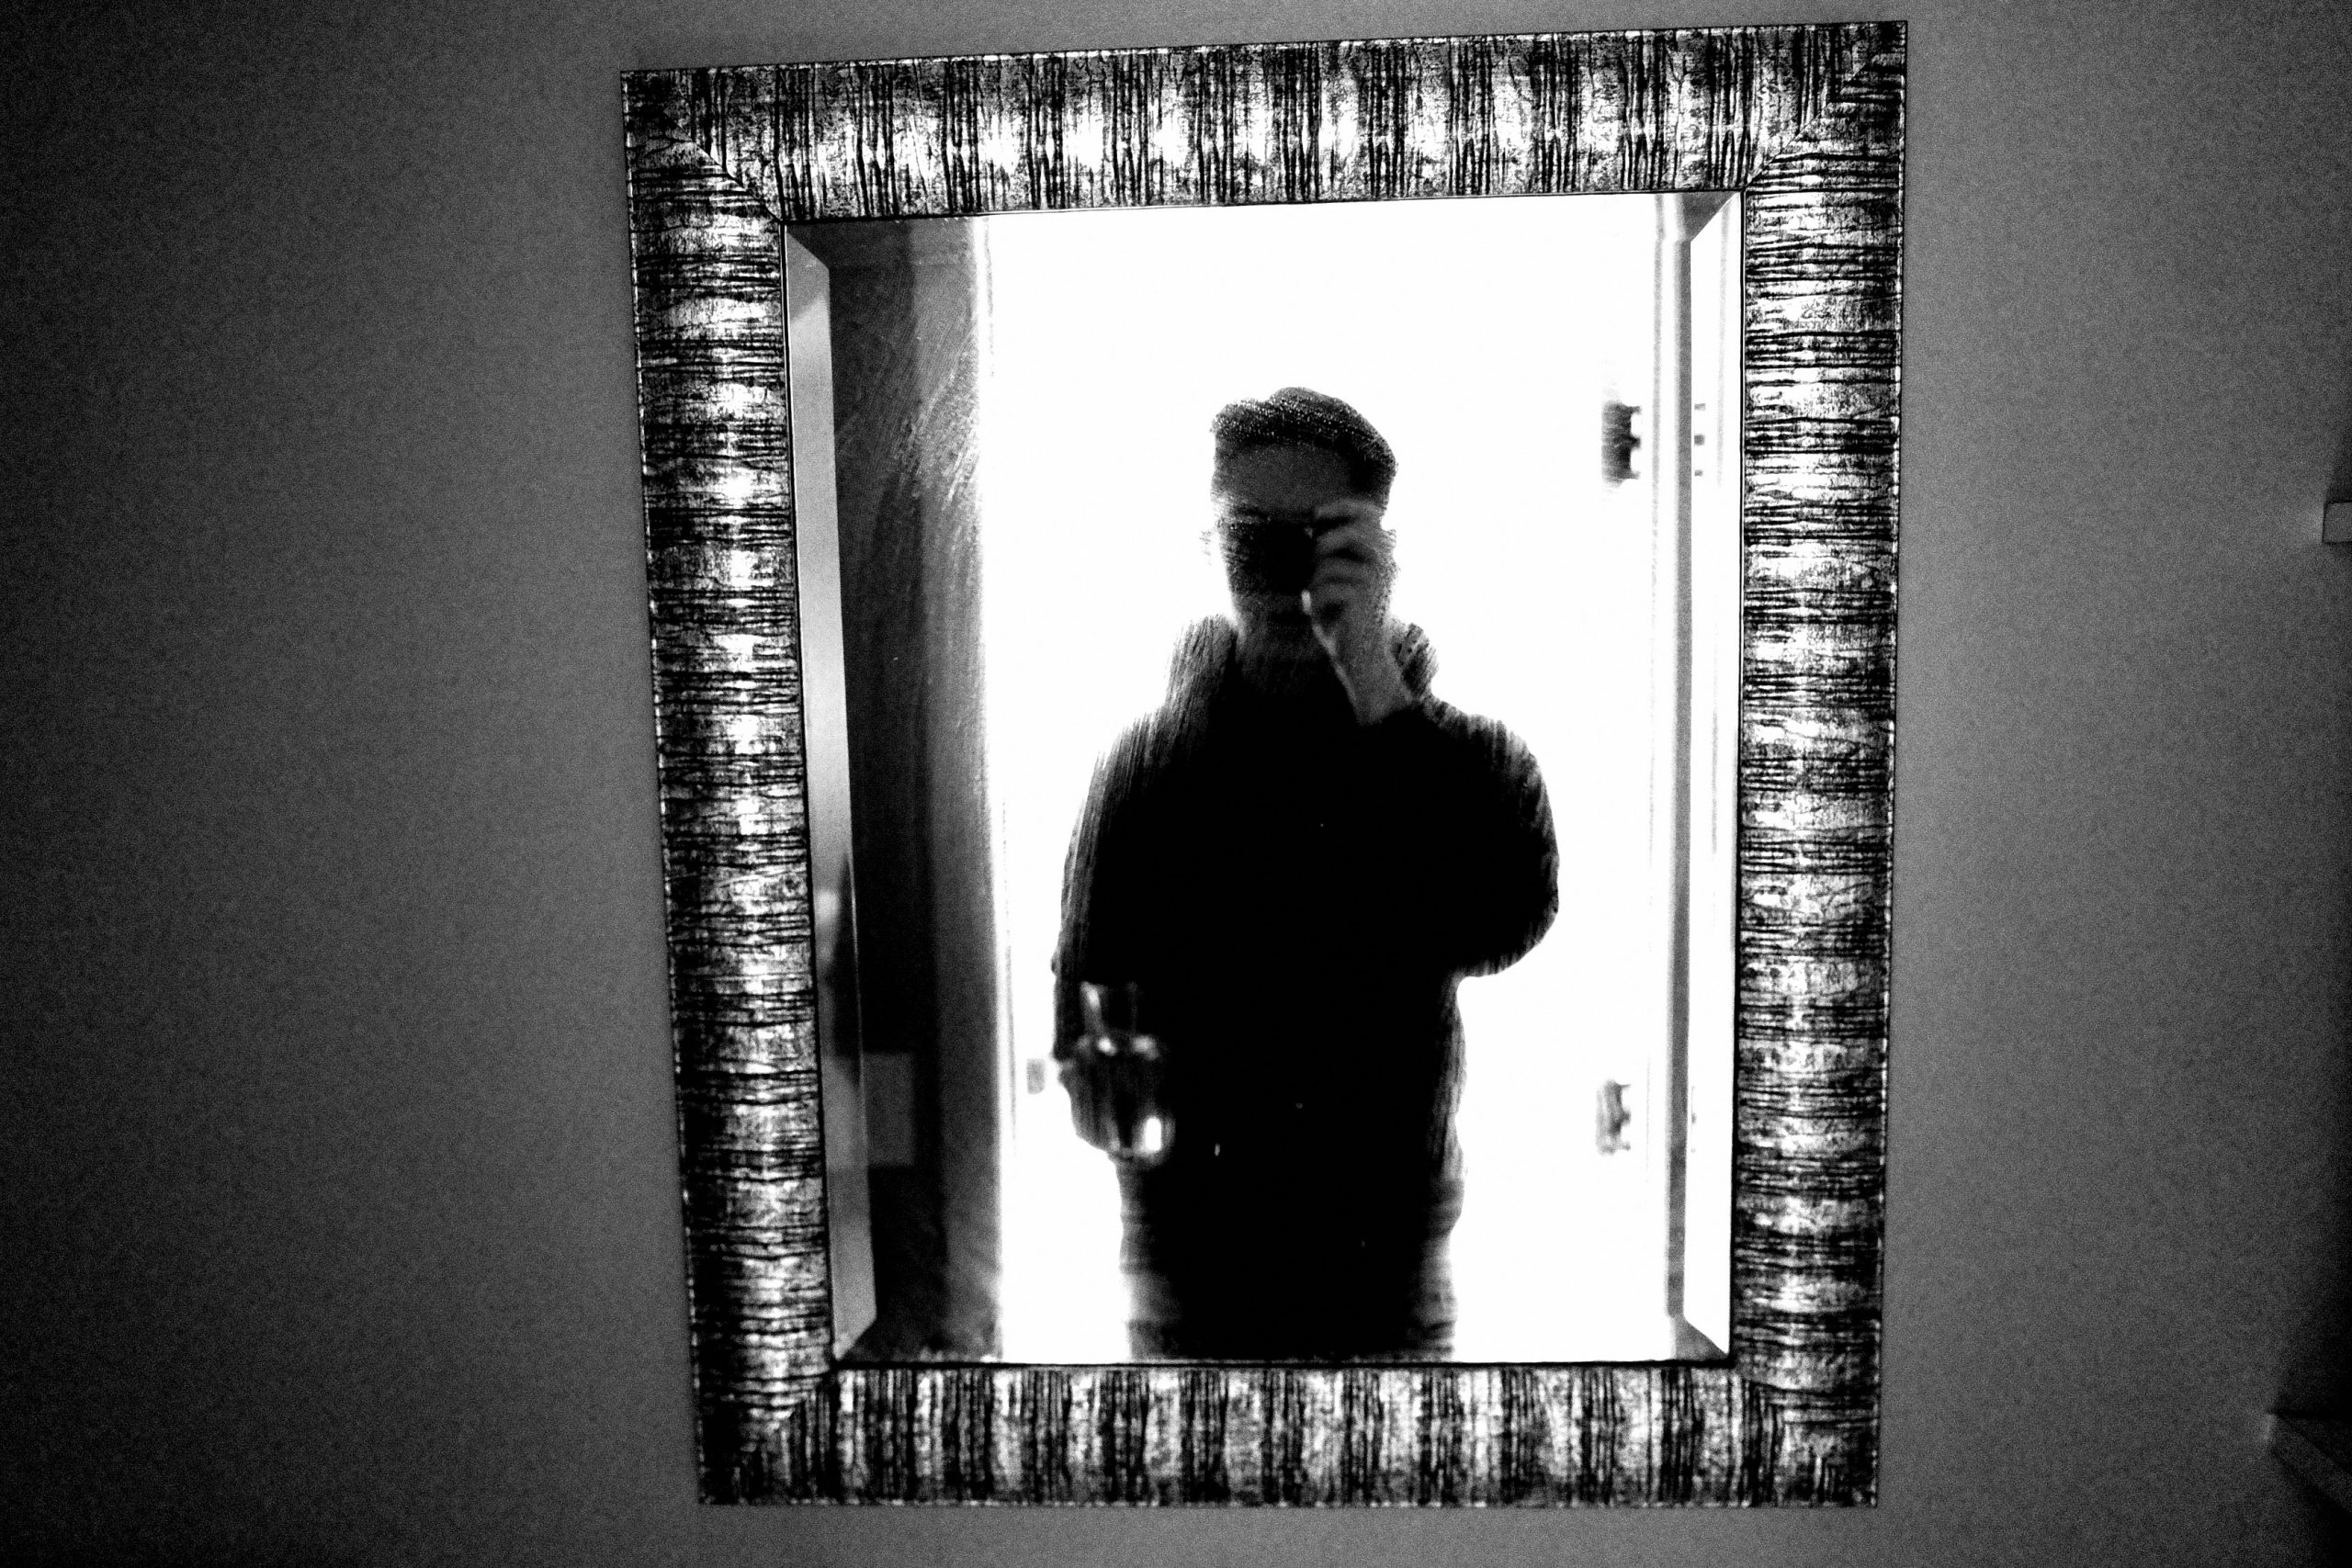 selfie Ricoh gr iii